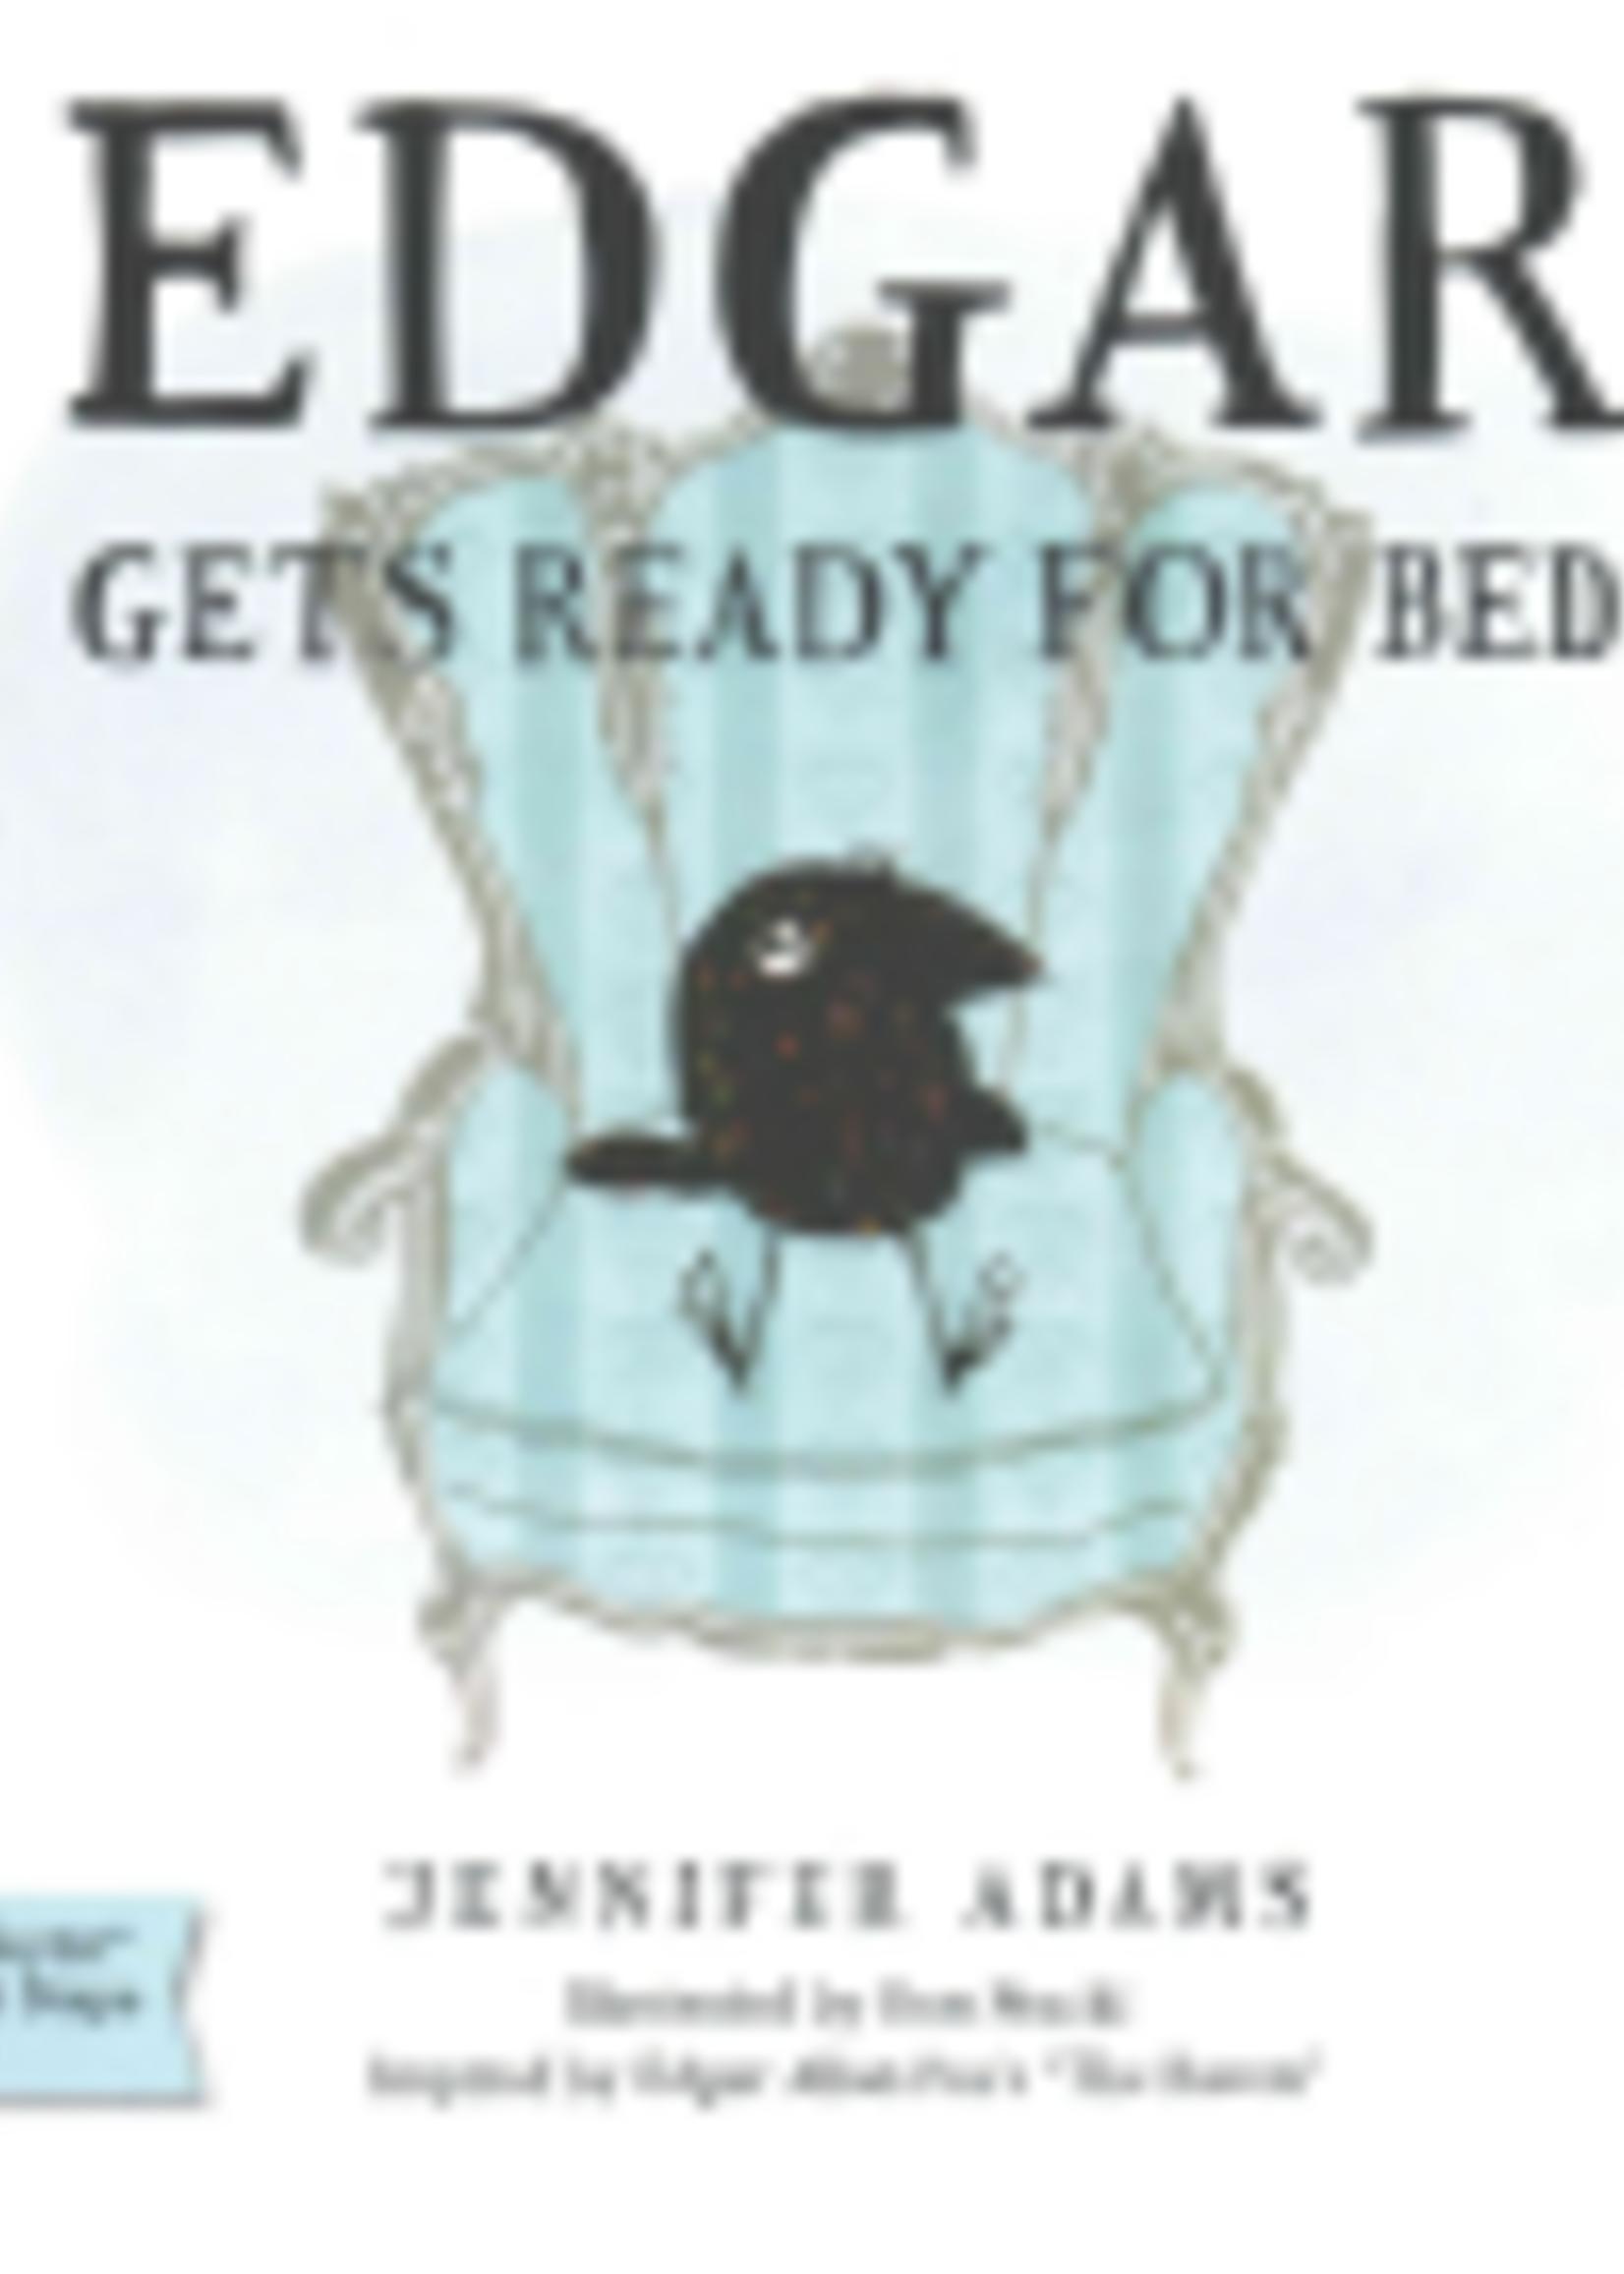 Edgar Gets Ready for Bed by Jennifer Adams by Ron Stucki, Edgar Allan Poe